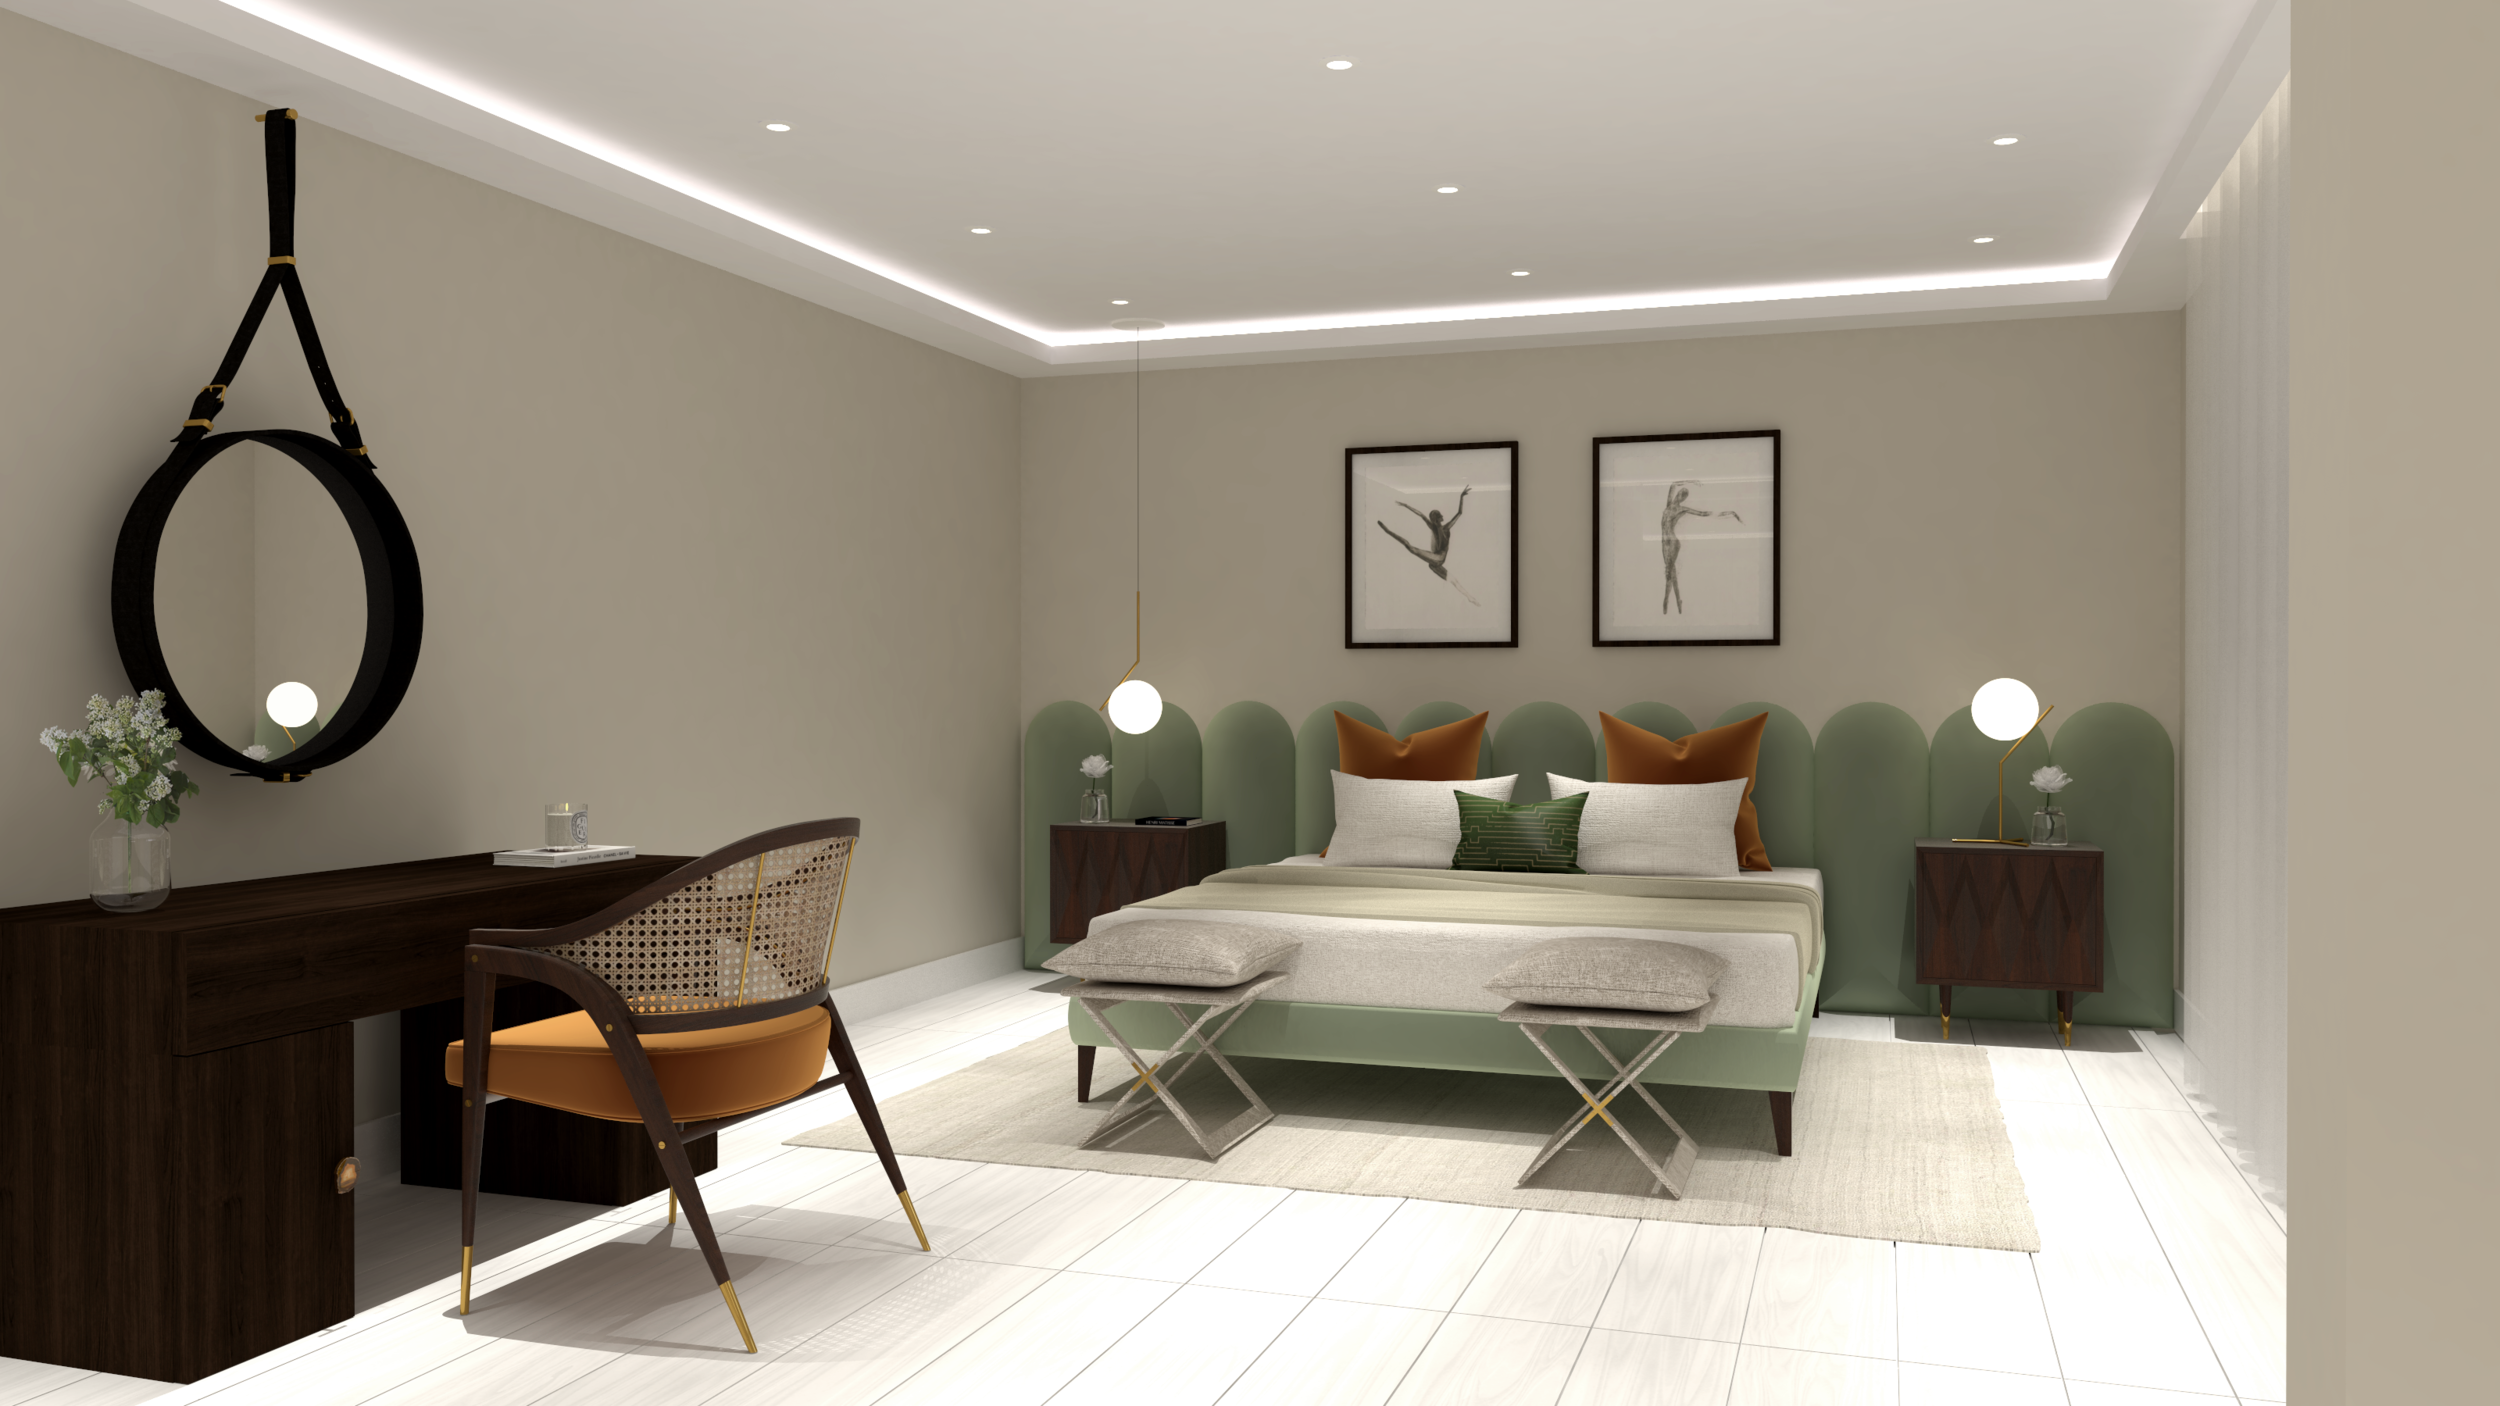 House of Sui Sui Melissa Bolivar Interior Designs Residential Home in Regents Park Primrose Hill Park Village East.png